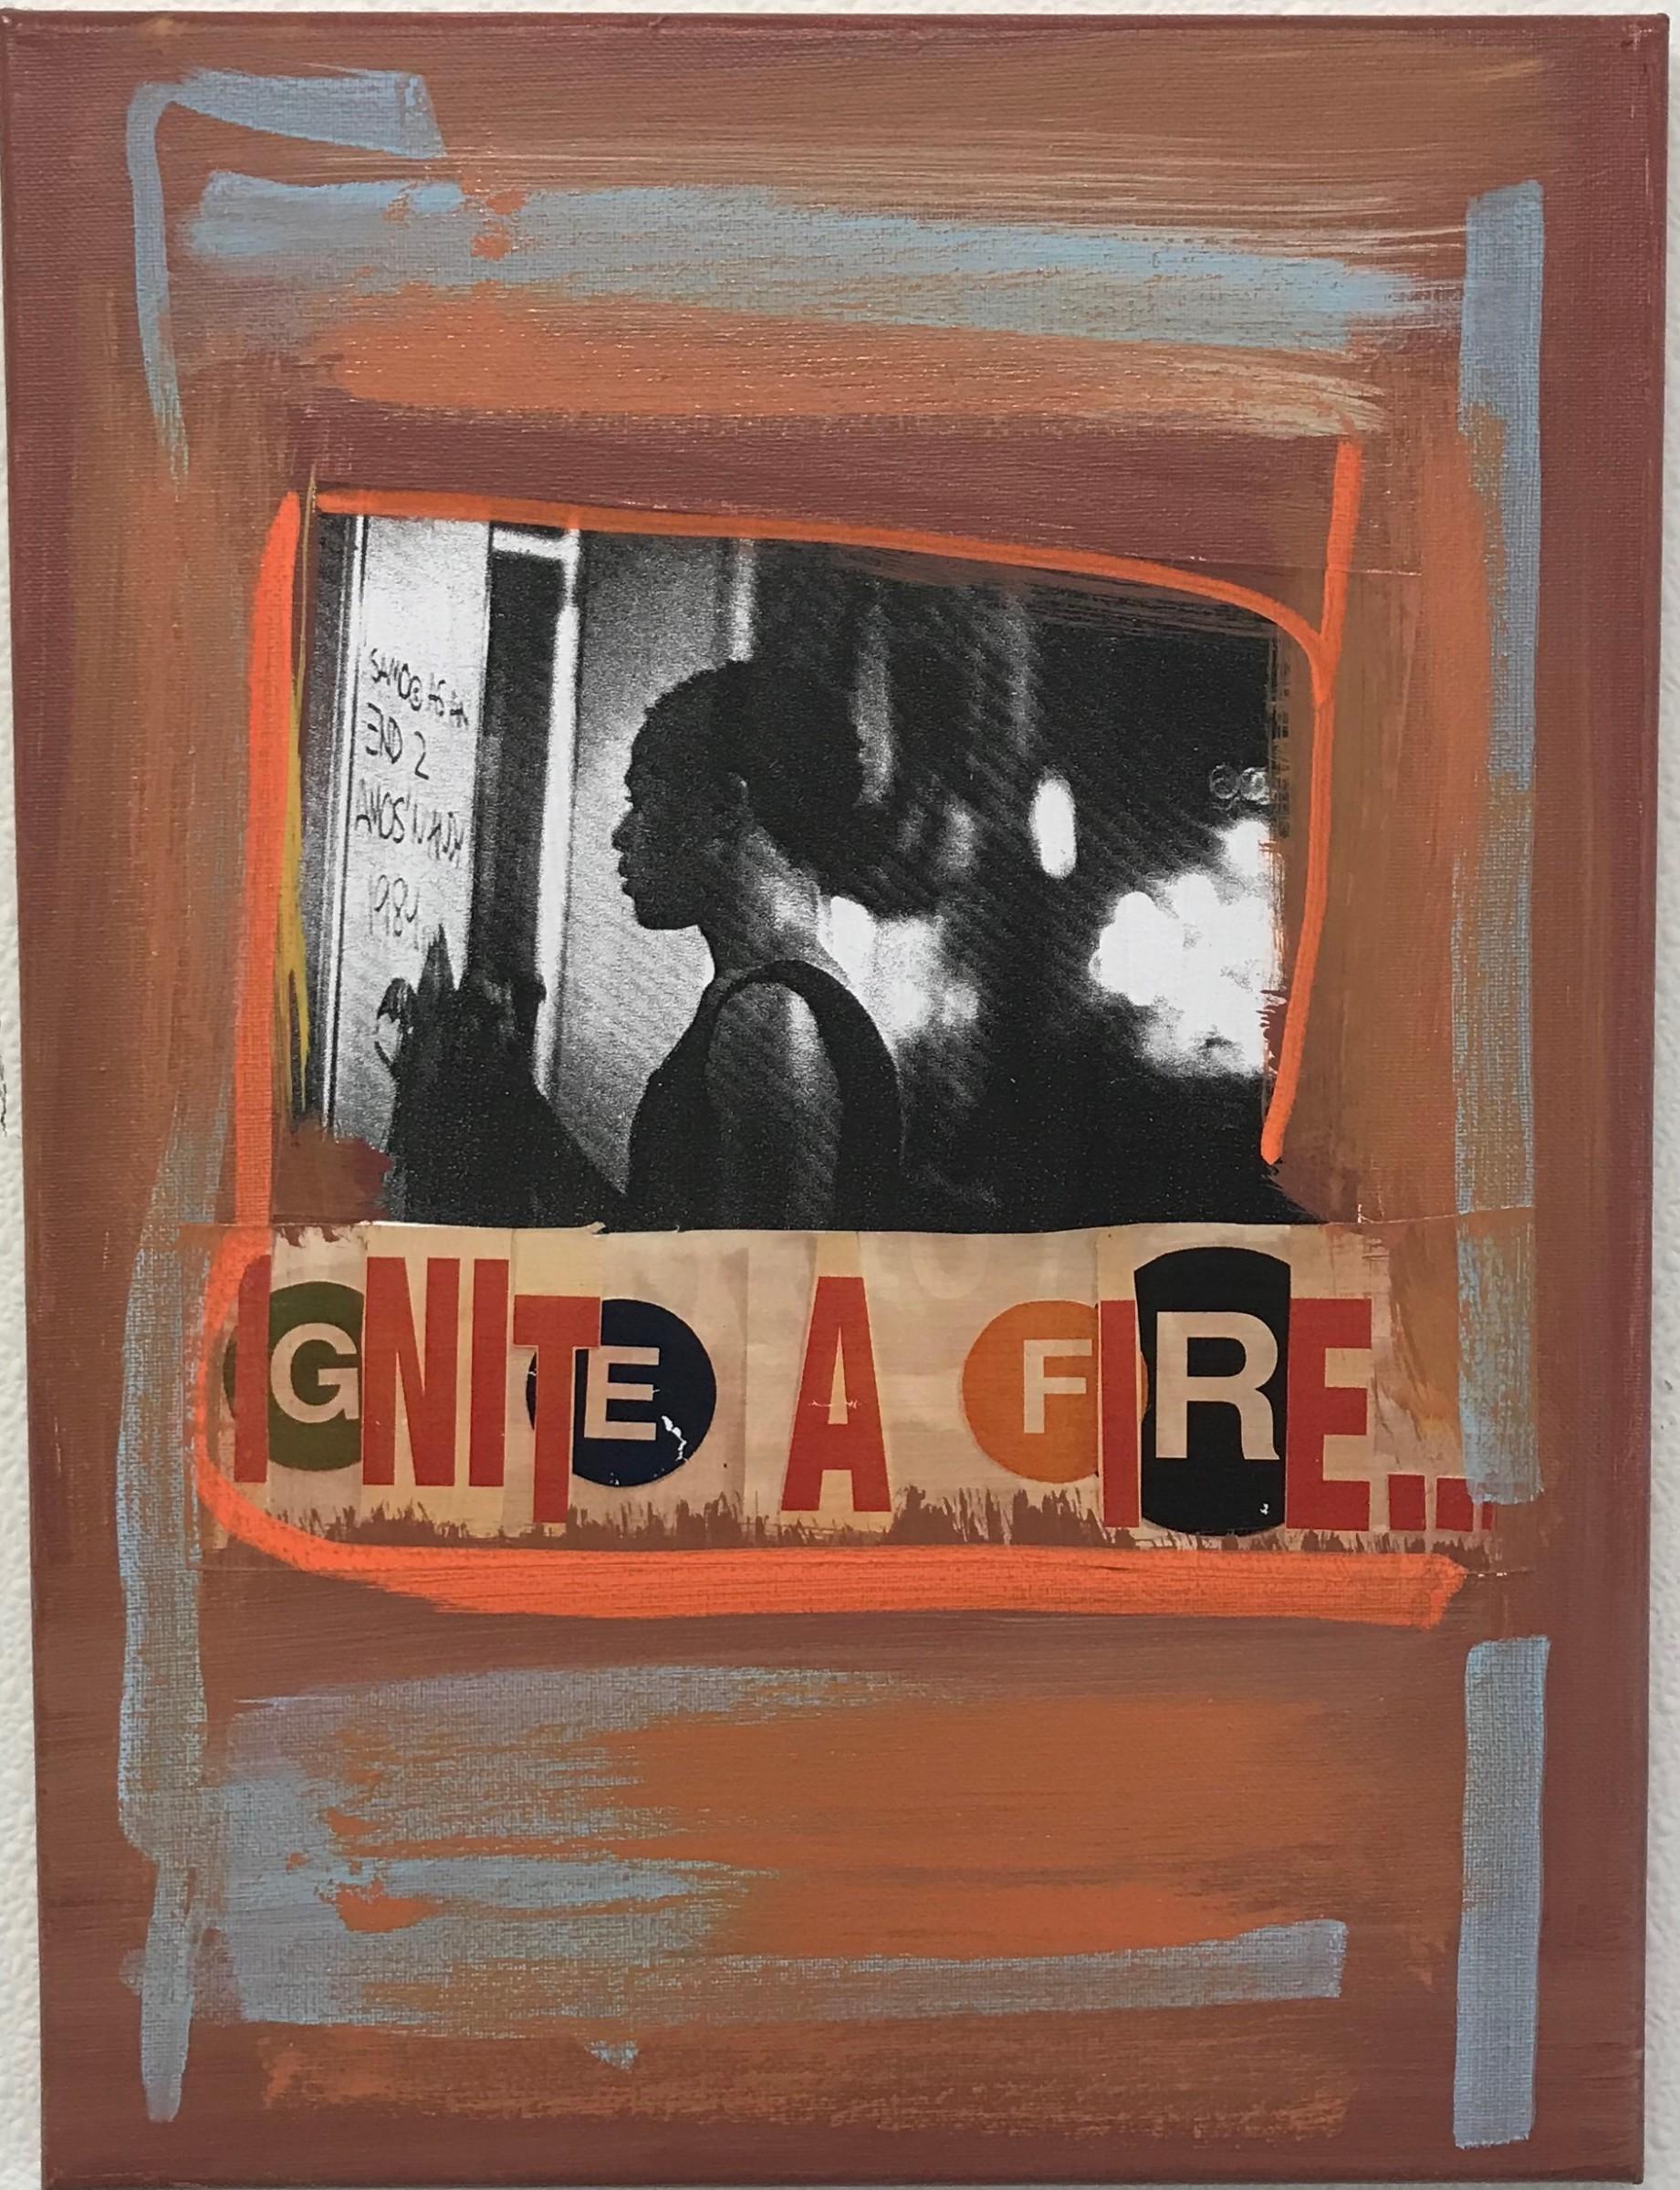 <span class=&#34;link fancybox-details-link&#34;><a href=&#34;/artworks/189-al-diaz-ignite-a-fire-2018/&#34;>View Detail Page</a></span><div class=&#34;artist&#34;><strong>Al Diaz</strong></div> <div class=&#34;title&#34;><em>Ignite a Fire</em>, 2018</div> <div class=&#34;medium&#34;>Mixed Media on Canvas</div> <div class=&#34;dimensions&#34;>12 x 16 in<br /> 30.5 x 40.6 cm</div>